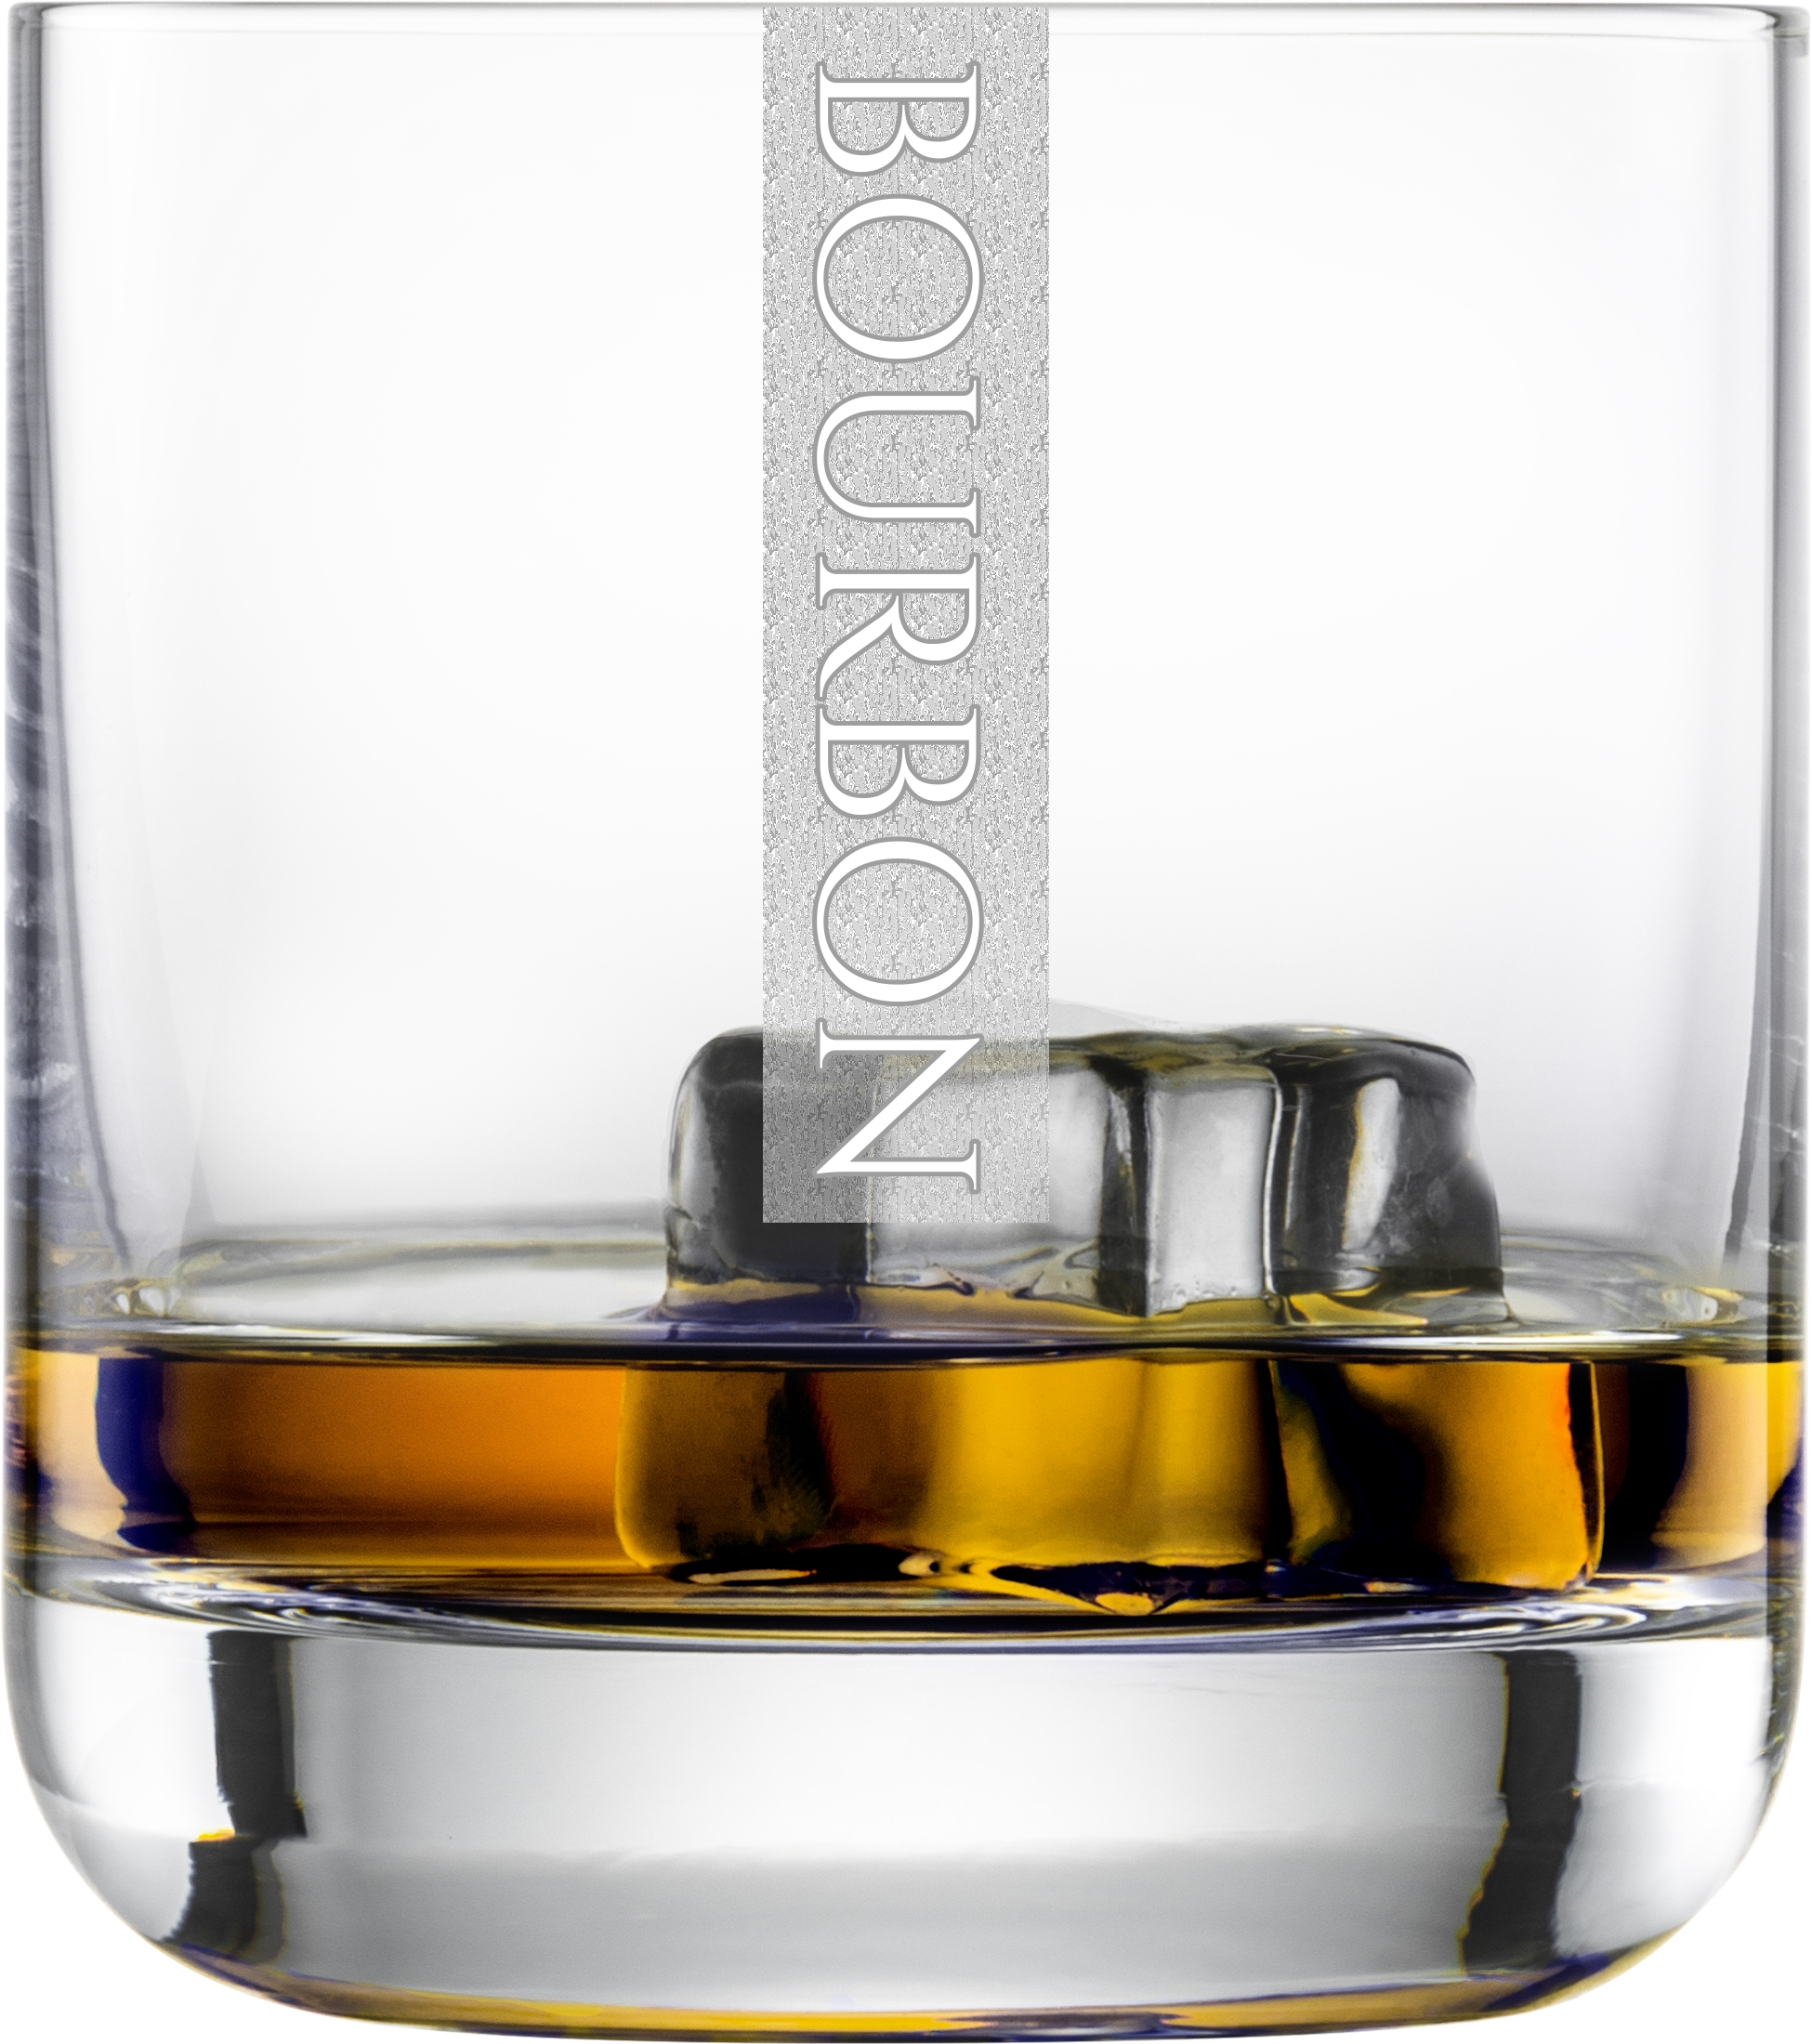 BOURBON Gläser | 6 Stück 300ml Schott Tumblerglas | CoolGlas